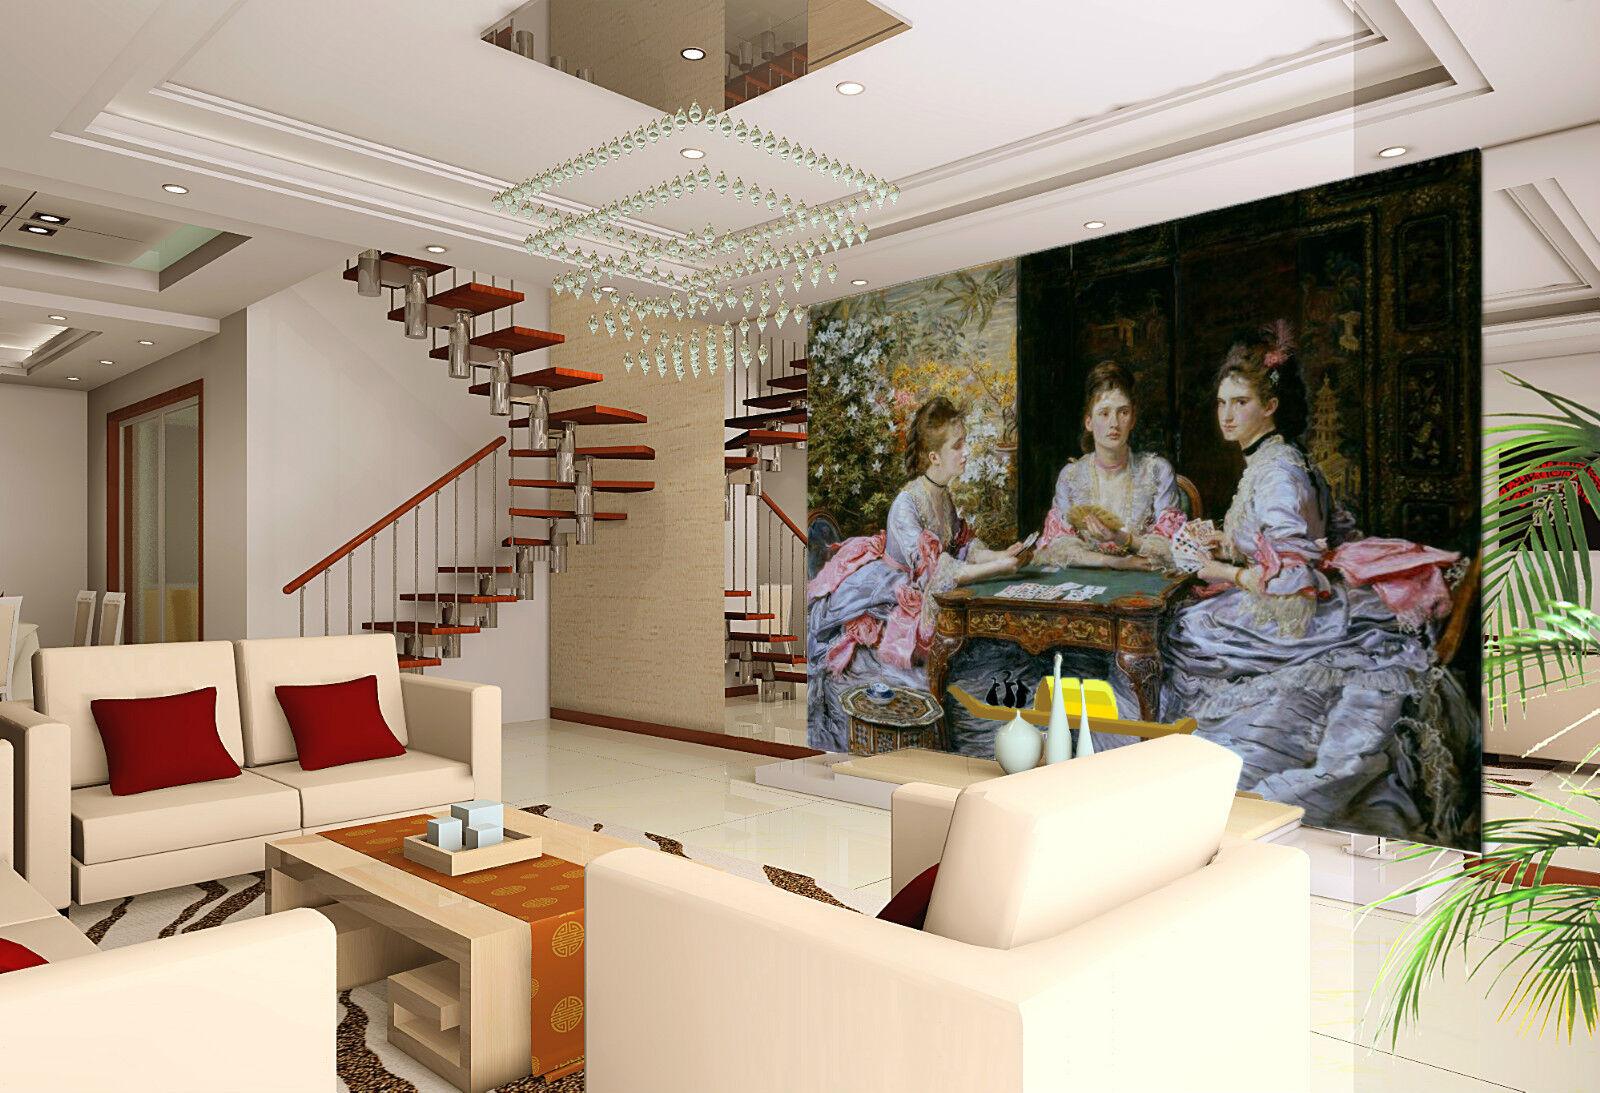 3D 3D 3D Art oil painting Girl WallPaper Print Wall Decal Wall Deco Indoor Wall Murals 45a5ac